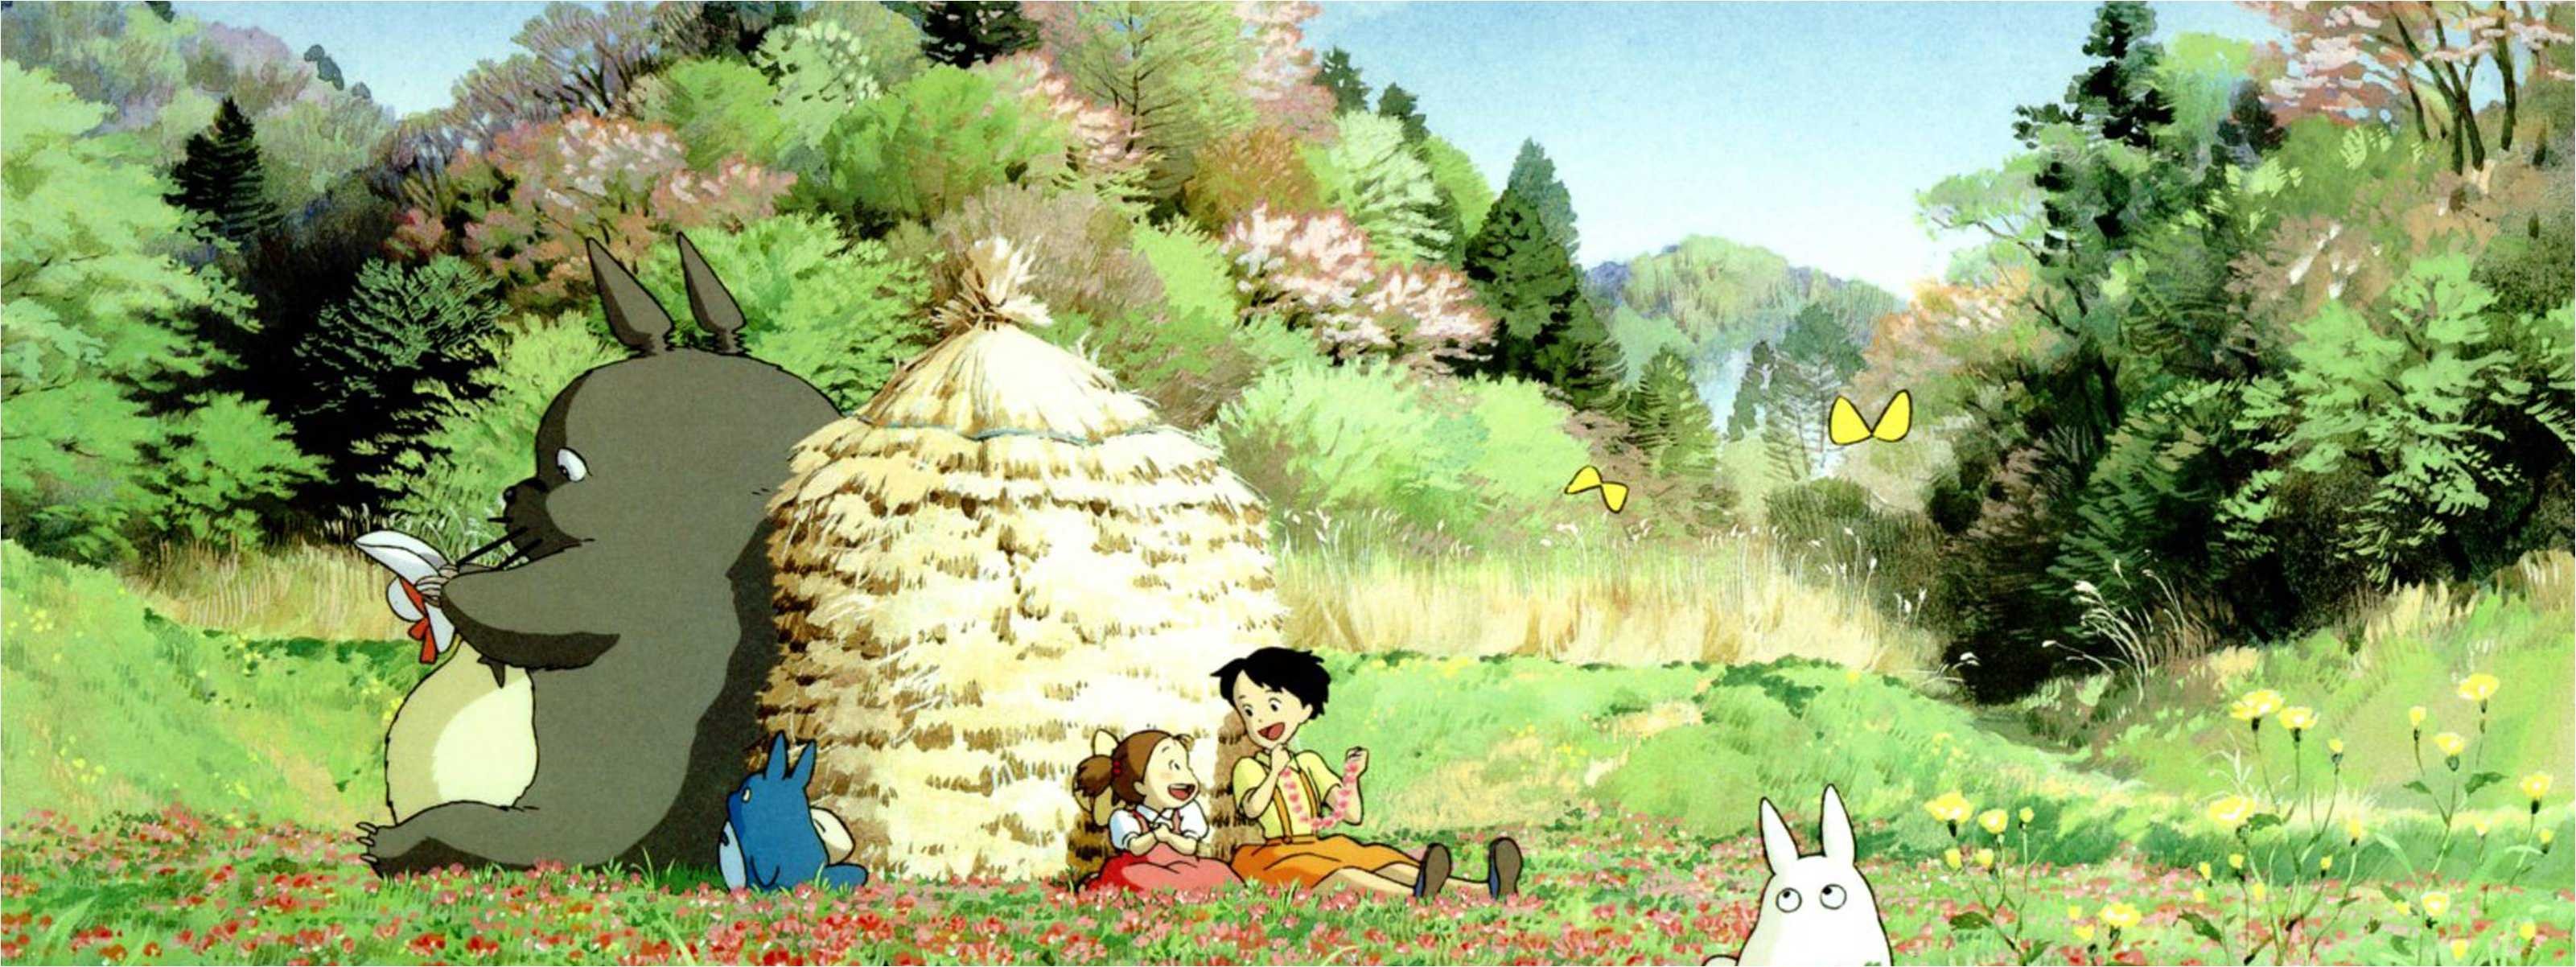 Studio Ghibli Wallpapers Hd Wallpaper Cave